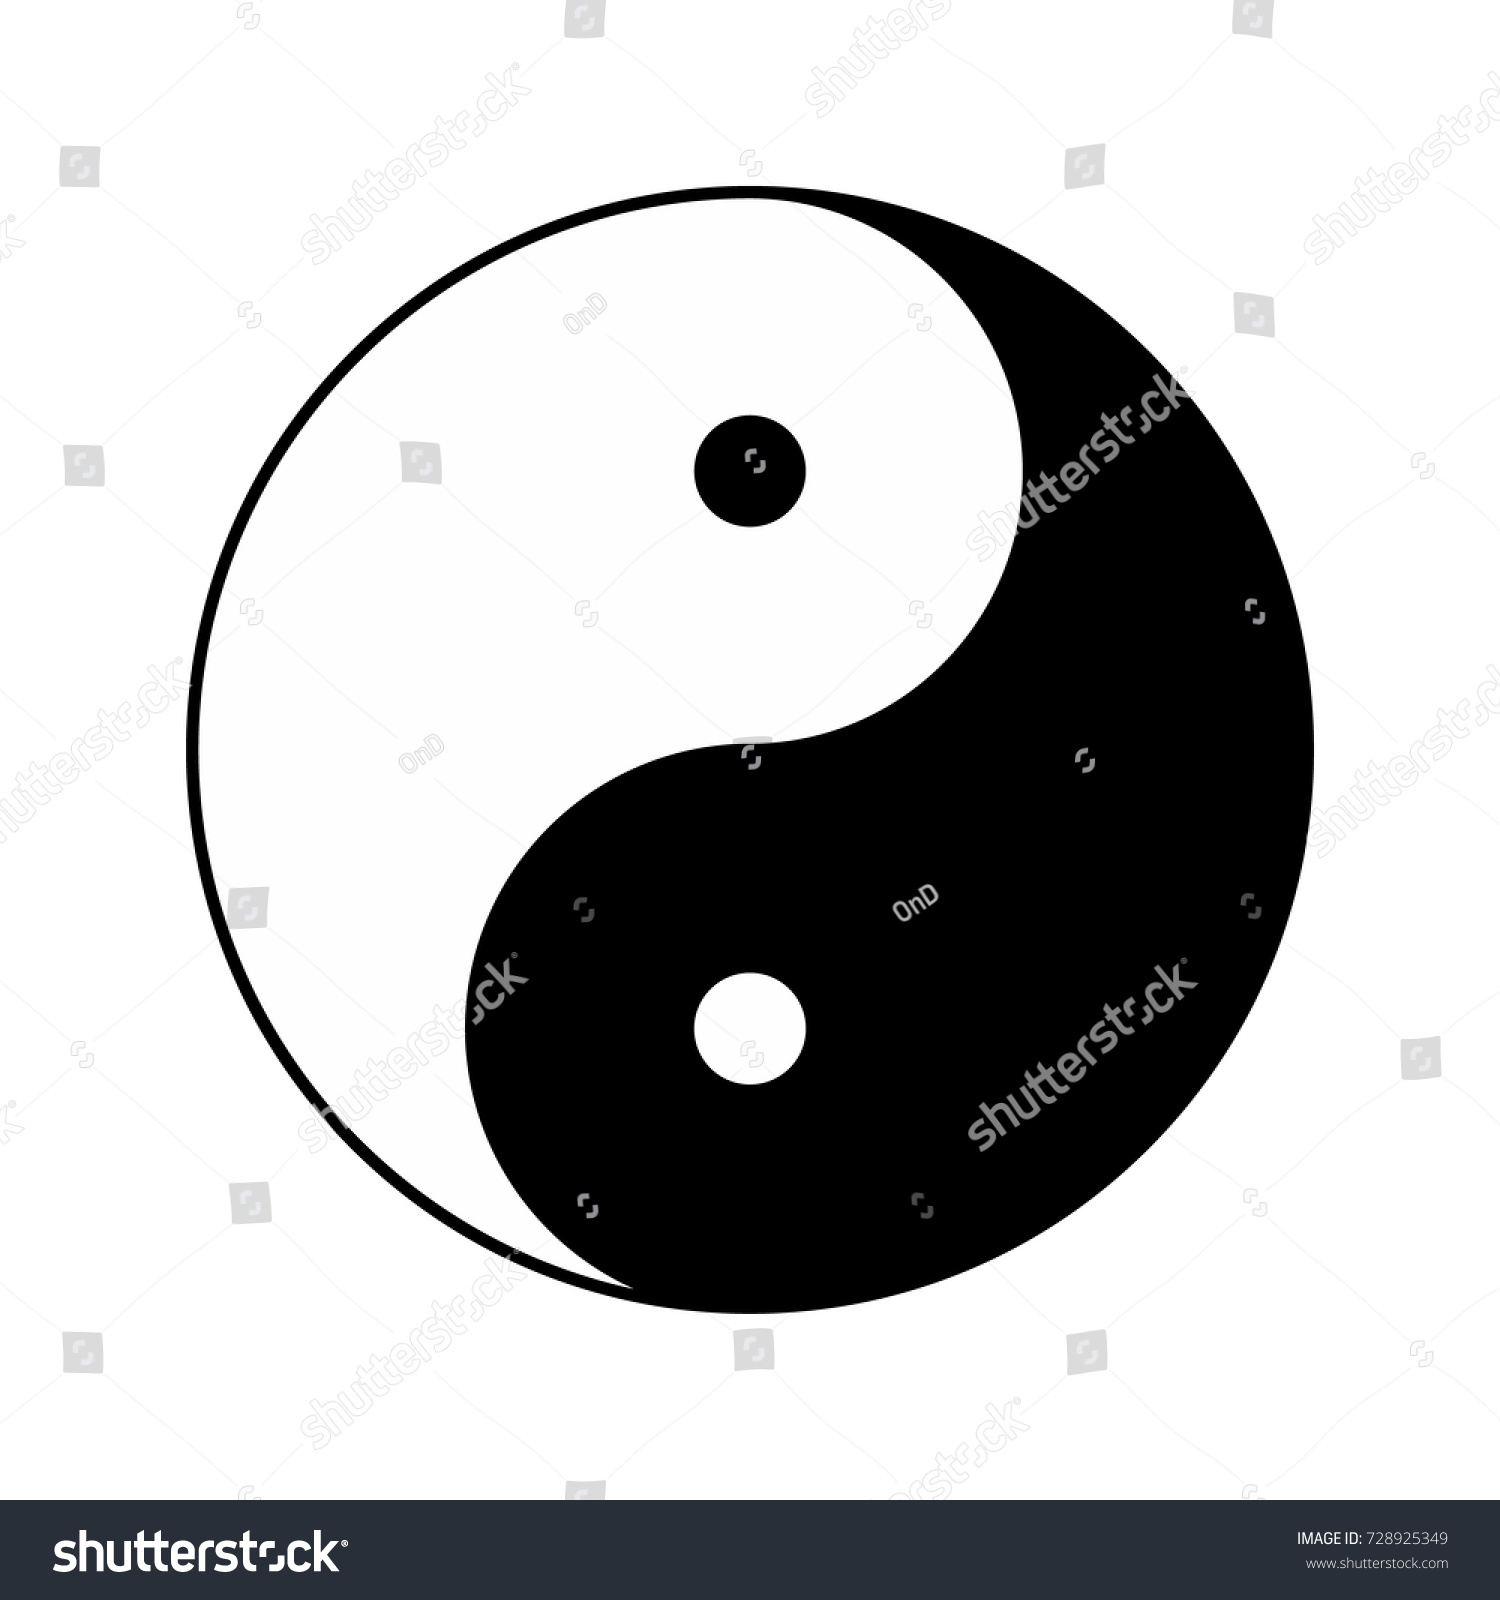 Yin yang religious symbol taoism vector stock vector 728925349 yin yang religious symbol of taoism vector illustration buycottarizona Images